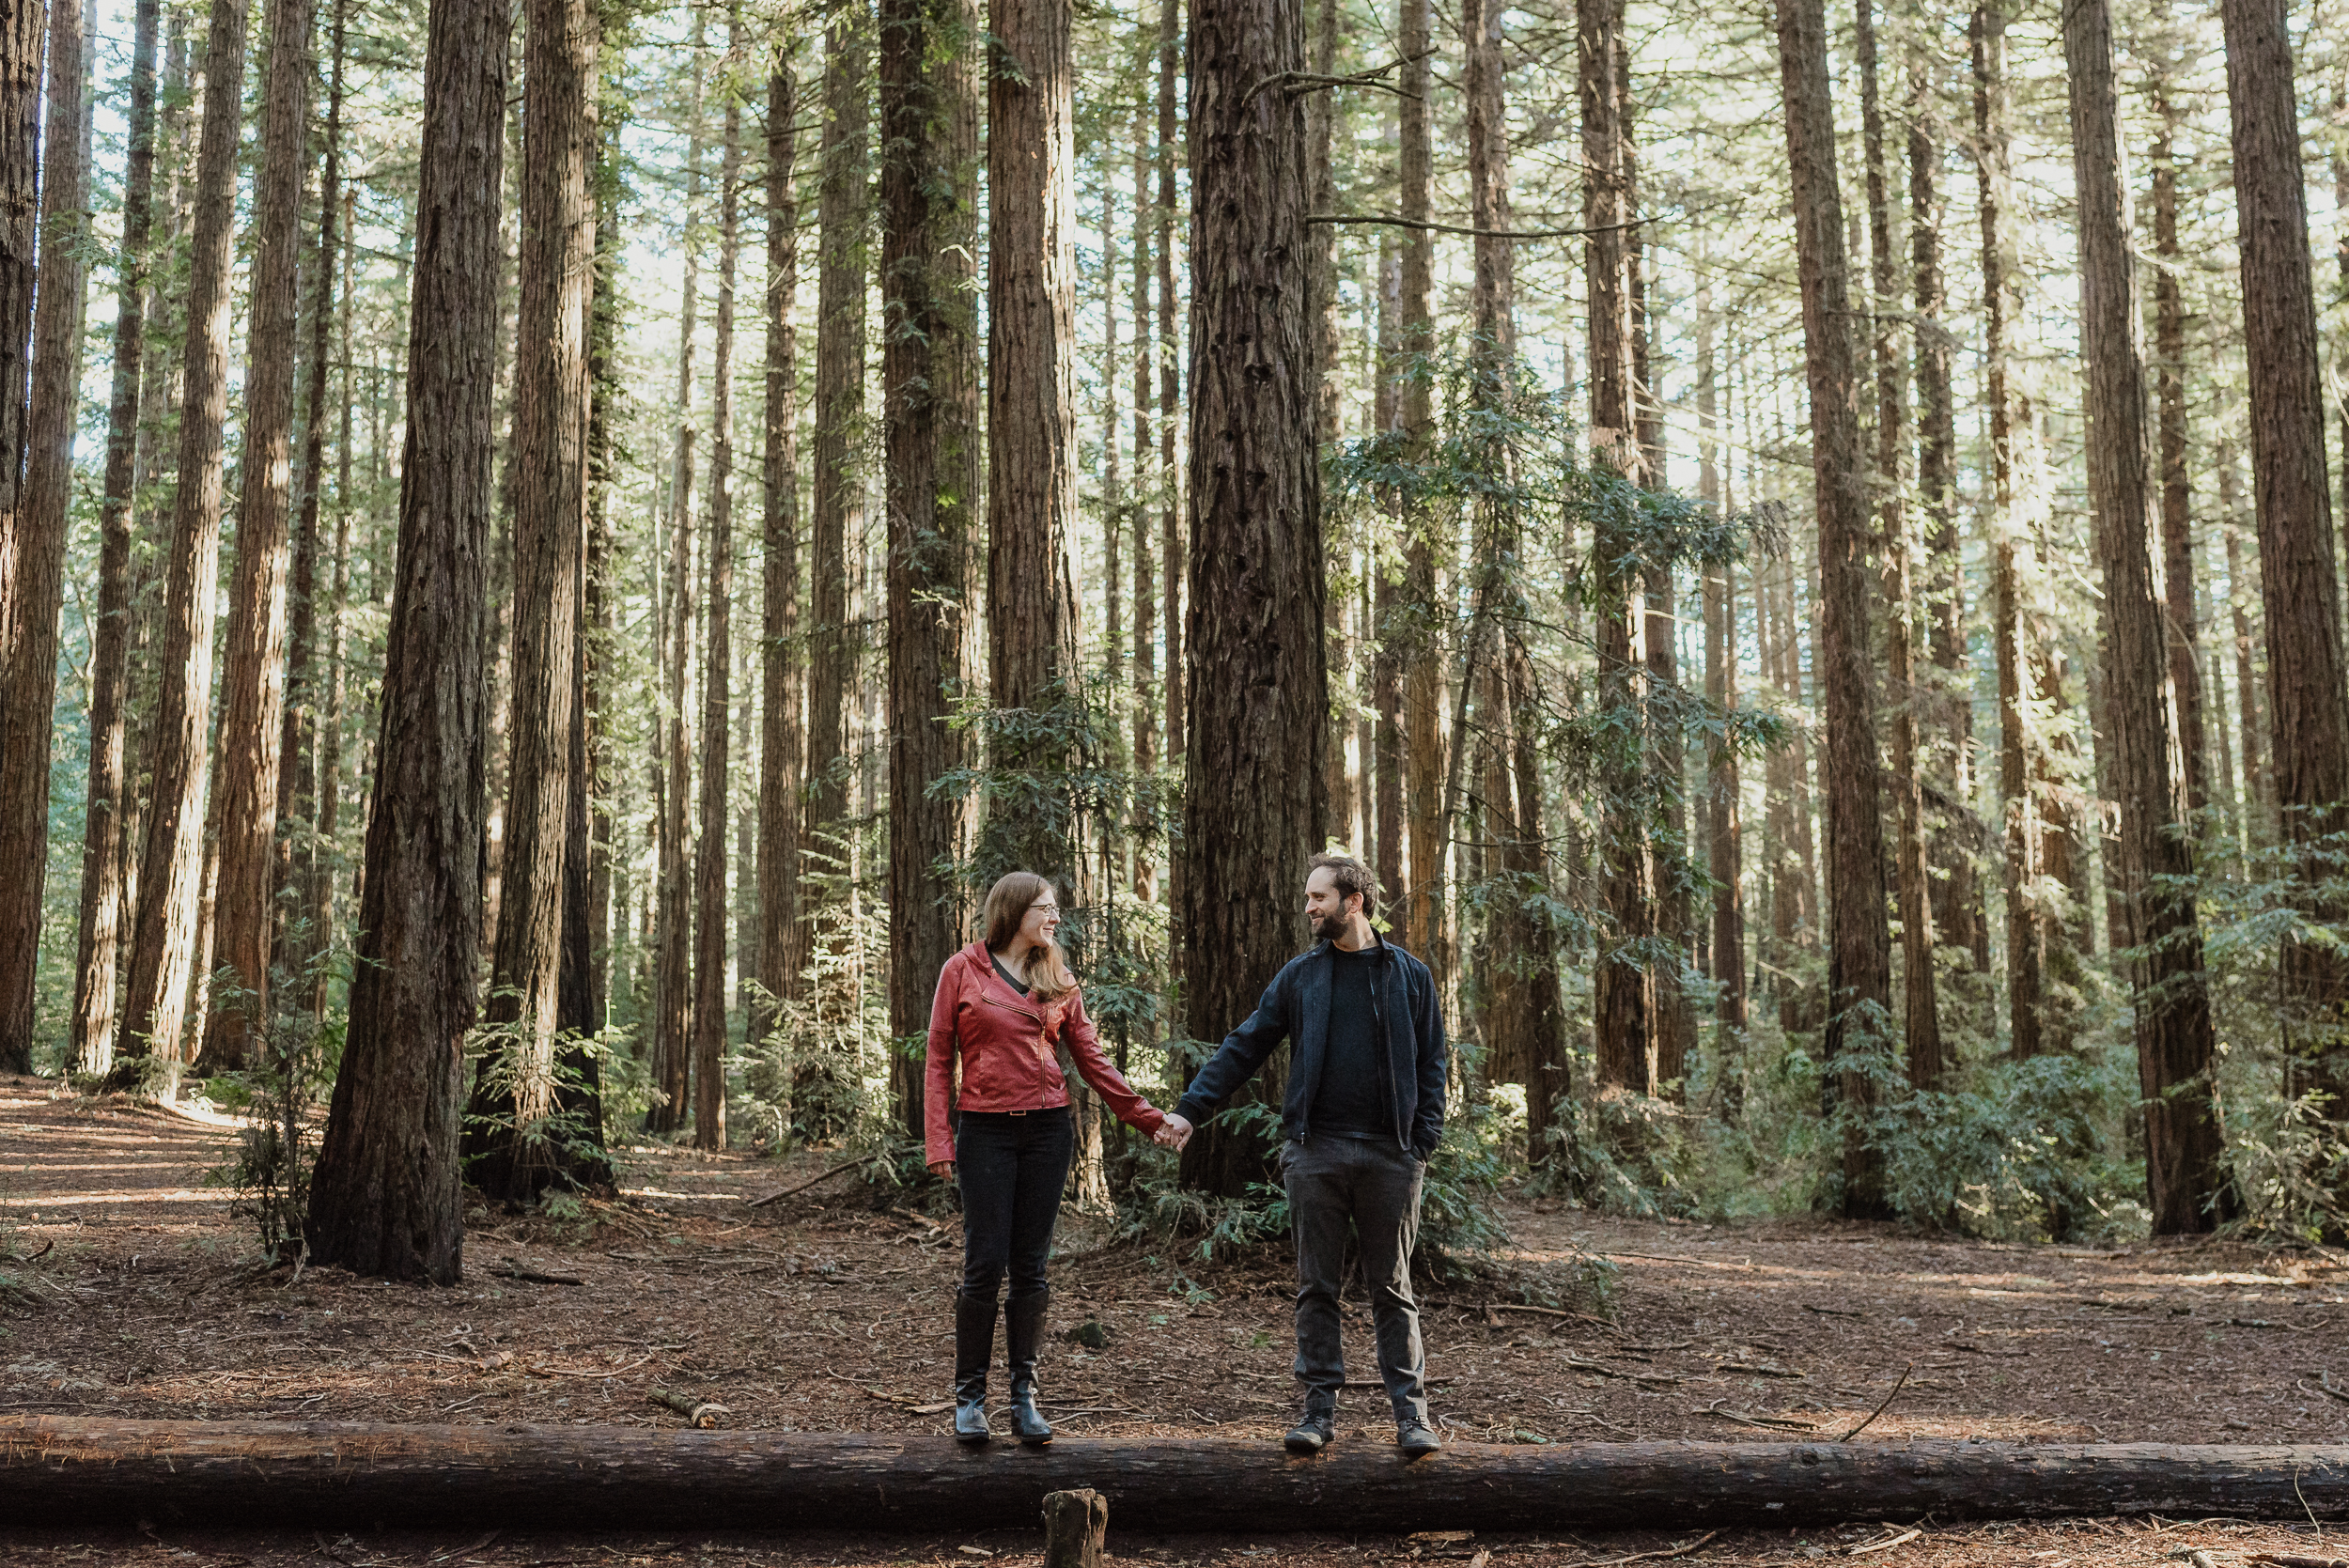 oakland-joaquin-miller-park-redwood-grove-engagement-session-vivianchen-022.jpg